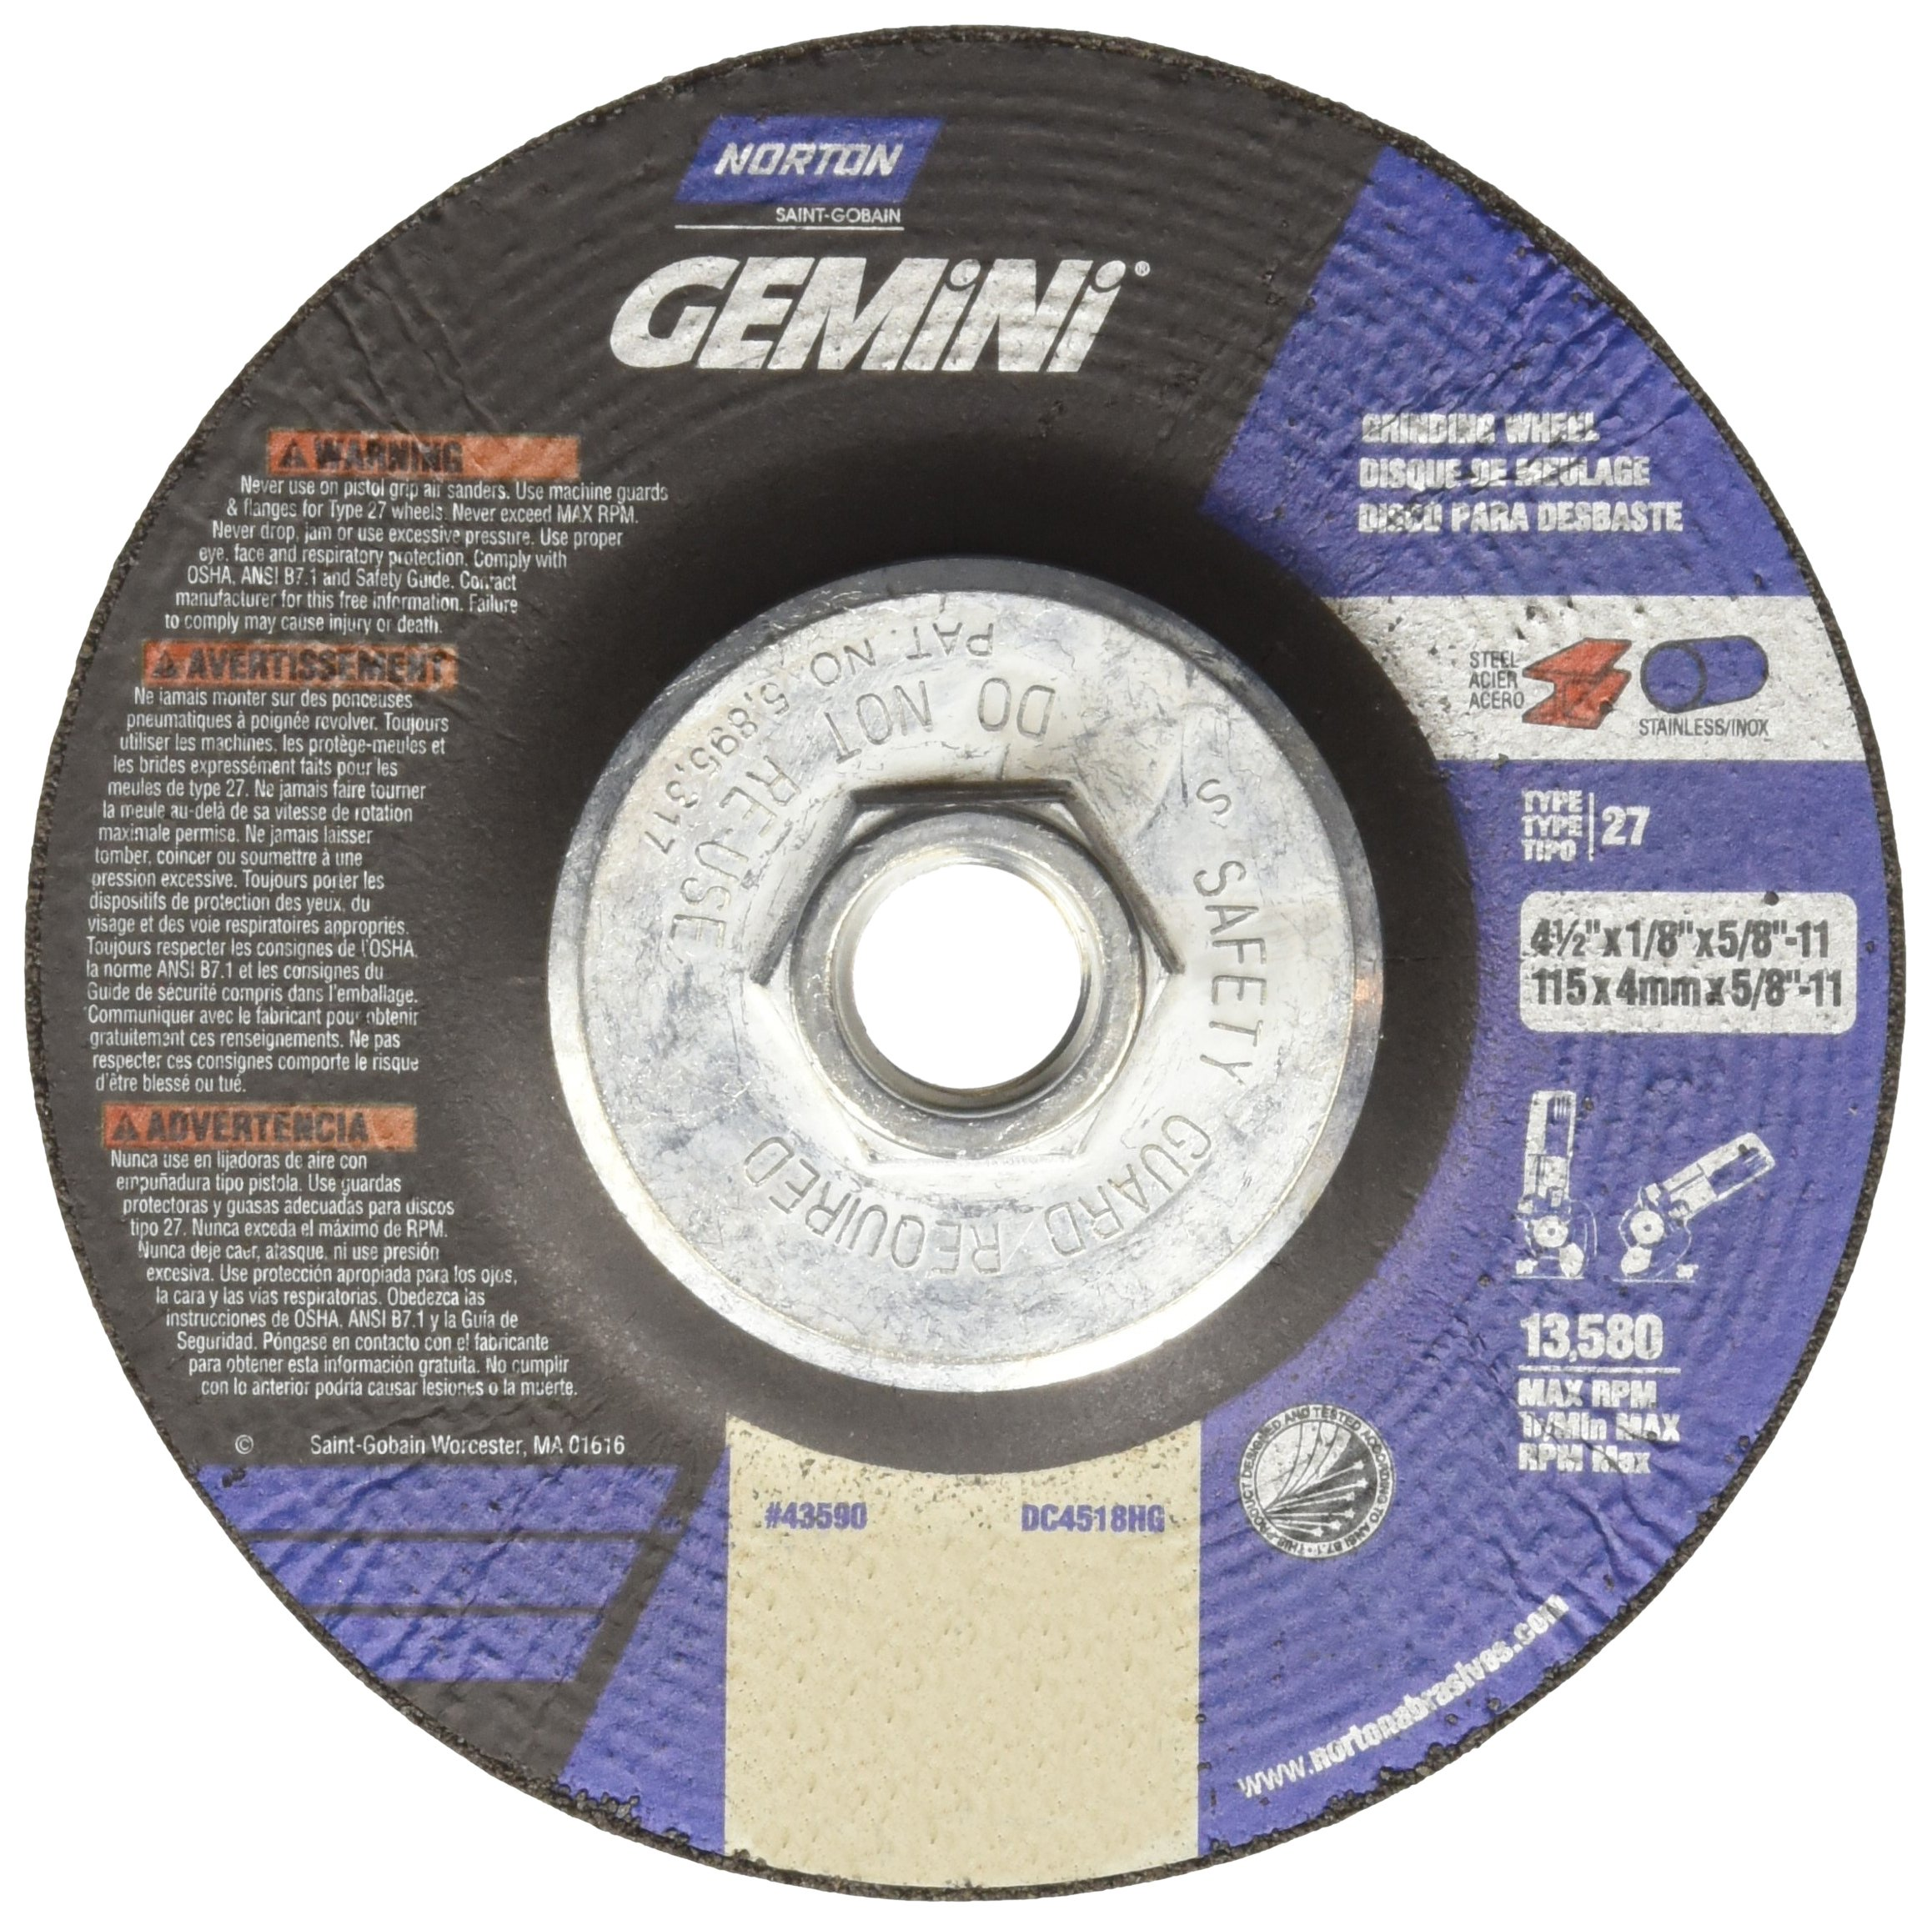 Norton Gemini Depressed Center Abrasive Wheel, Type 27, Aluminium Oxide, 5/8''-11 Hub, 4-1/2'' Diameter x 1/8'' Thickness   (Pack of 10)